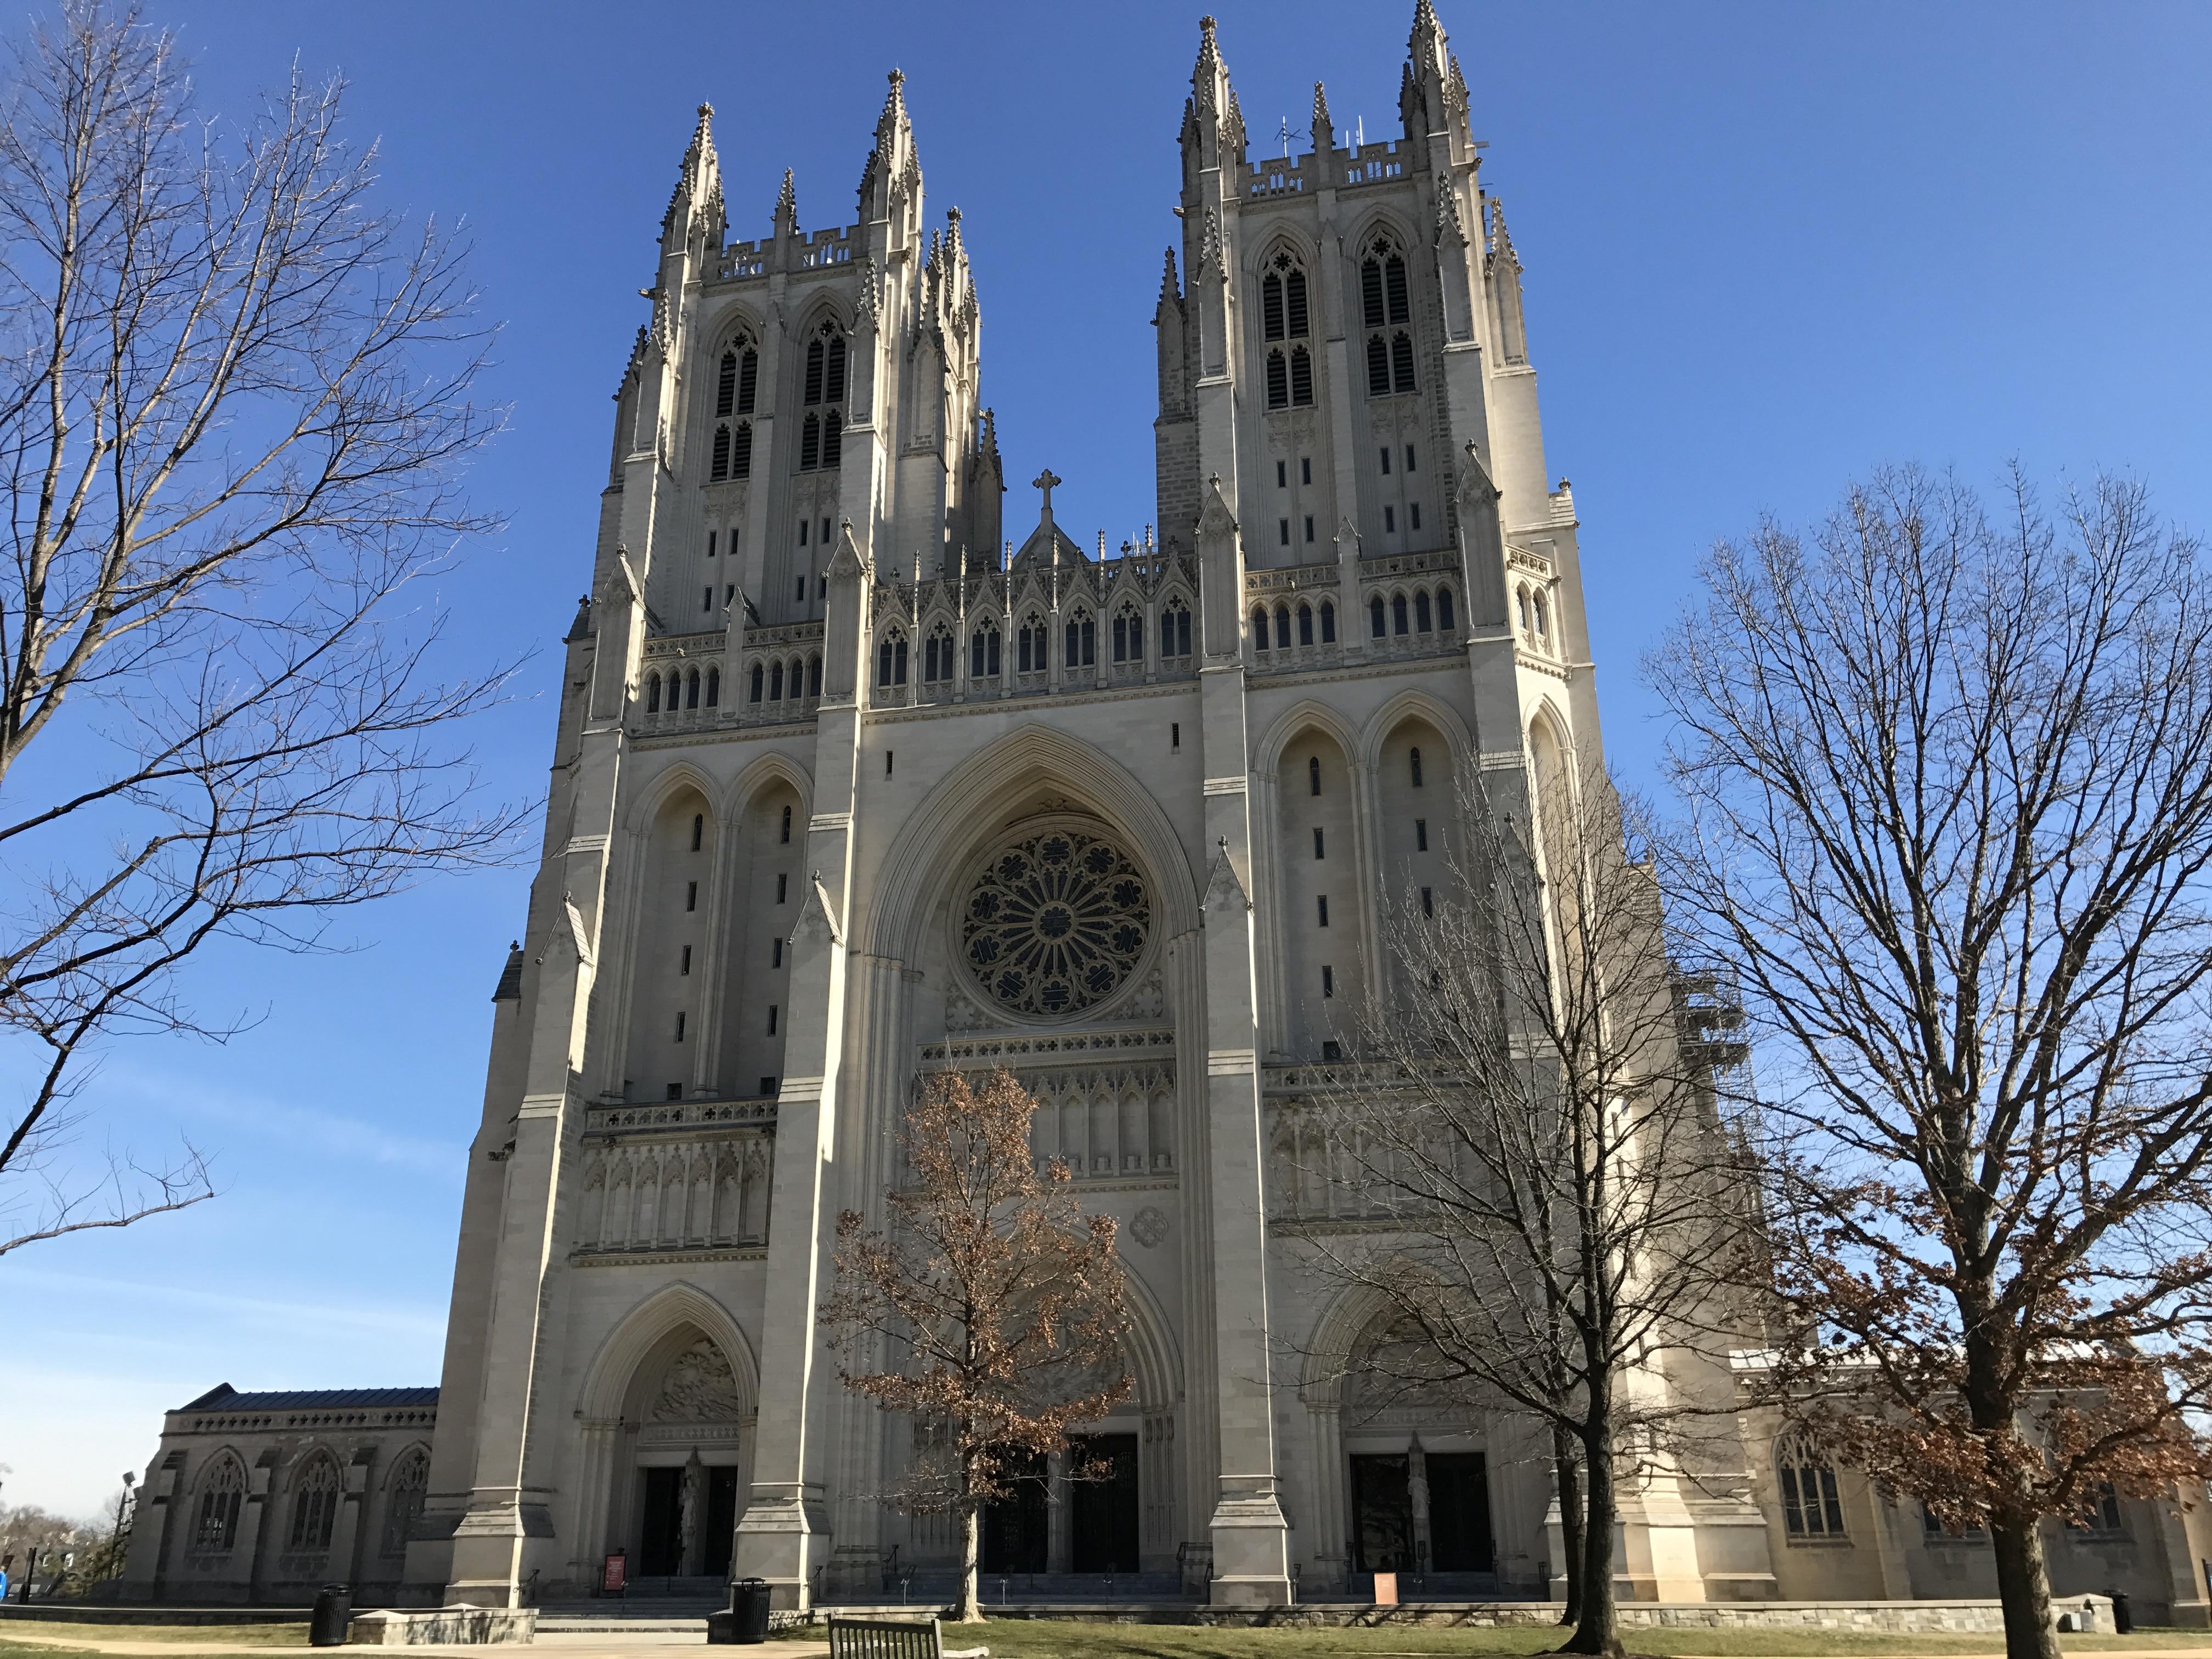 'Violent,' 'dehumanizing,' 'dangerous': National Cathedral ...